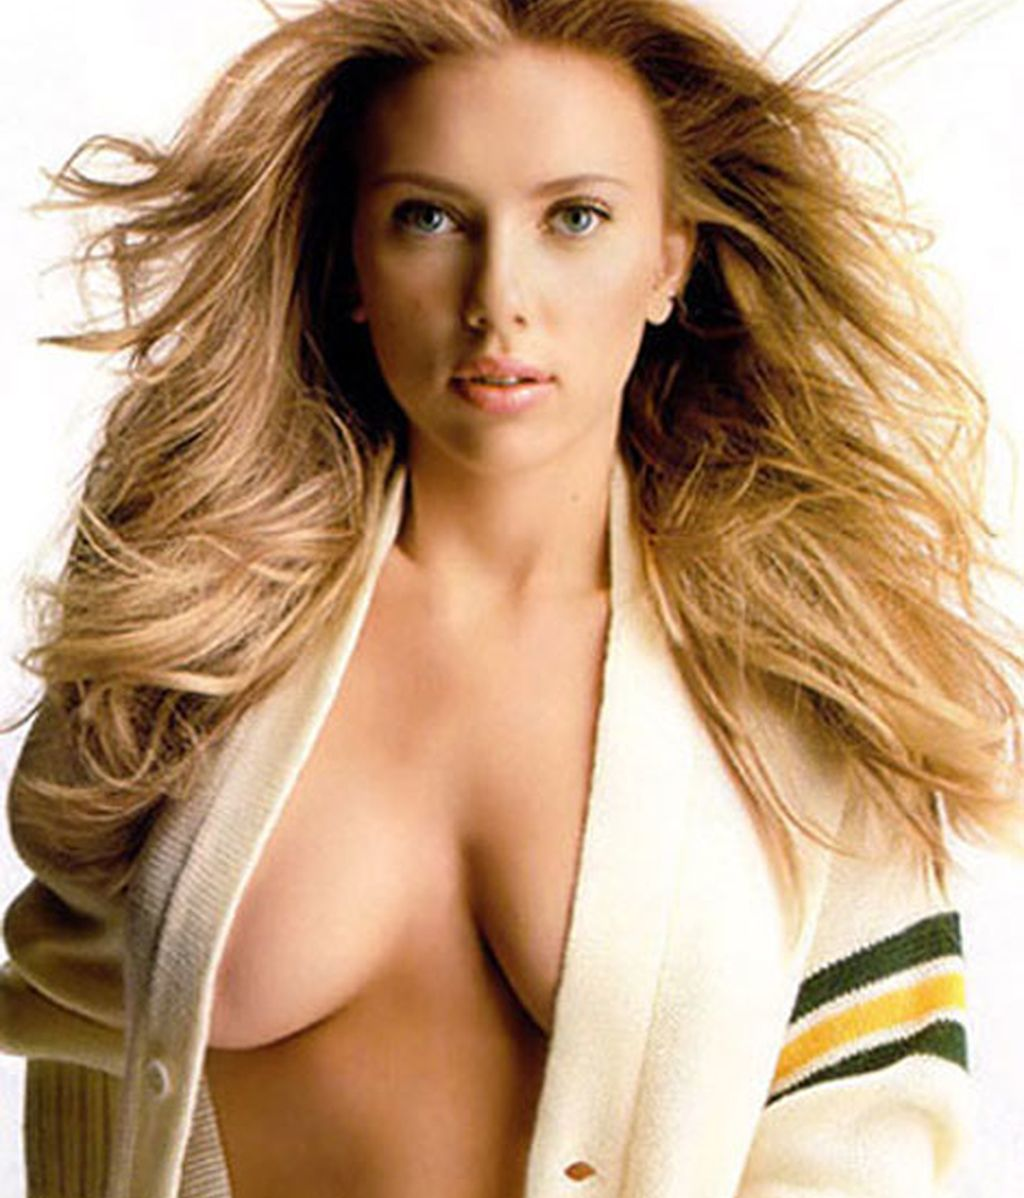 Scarlett Johansson ocupa el décimo lugar